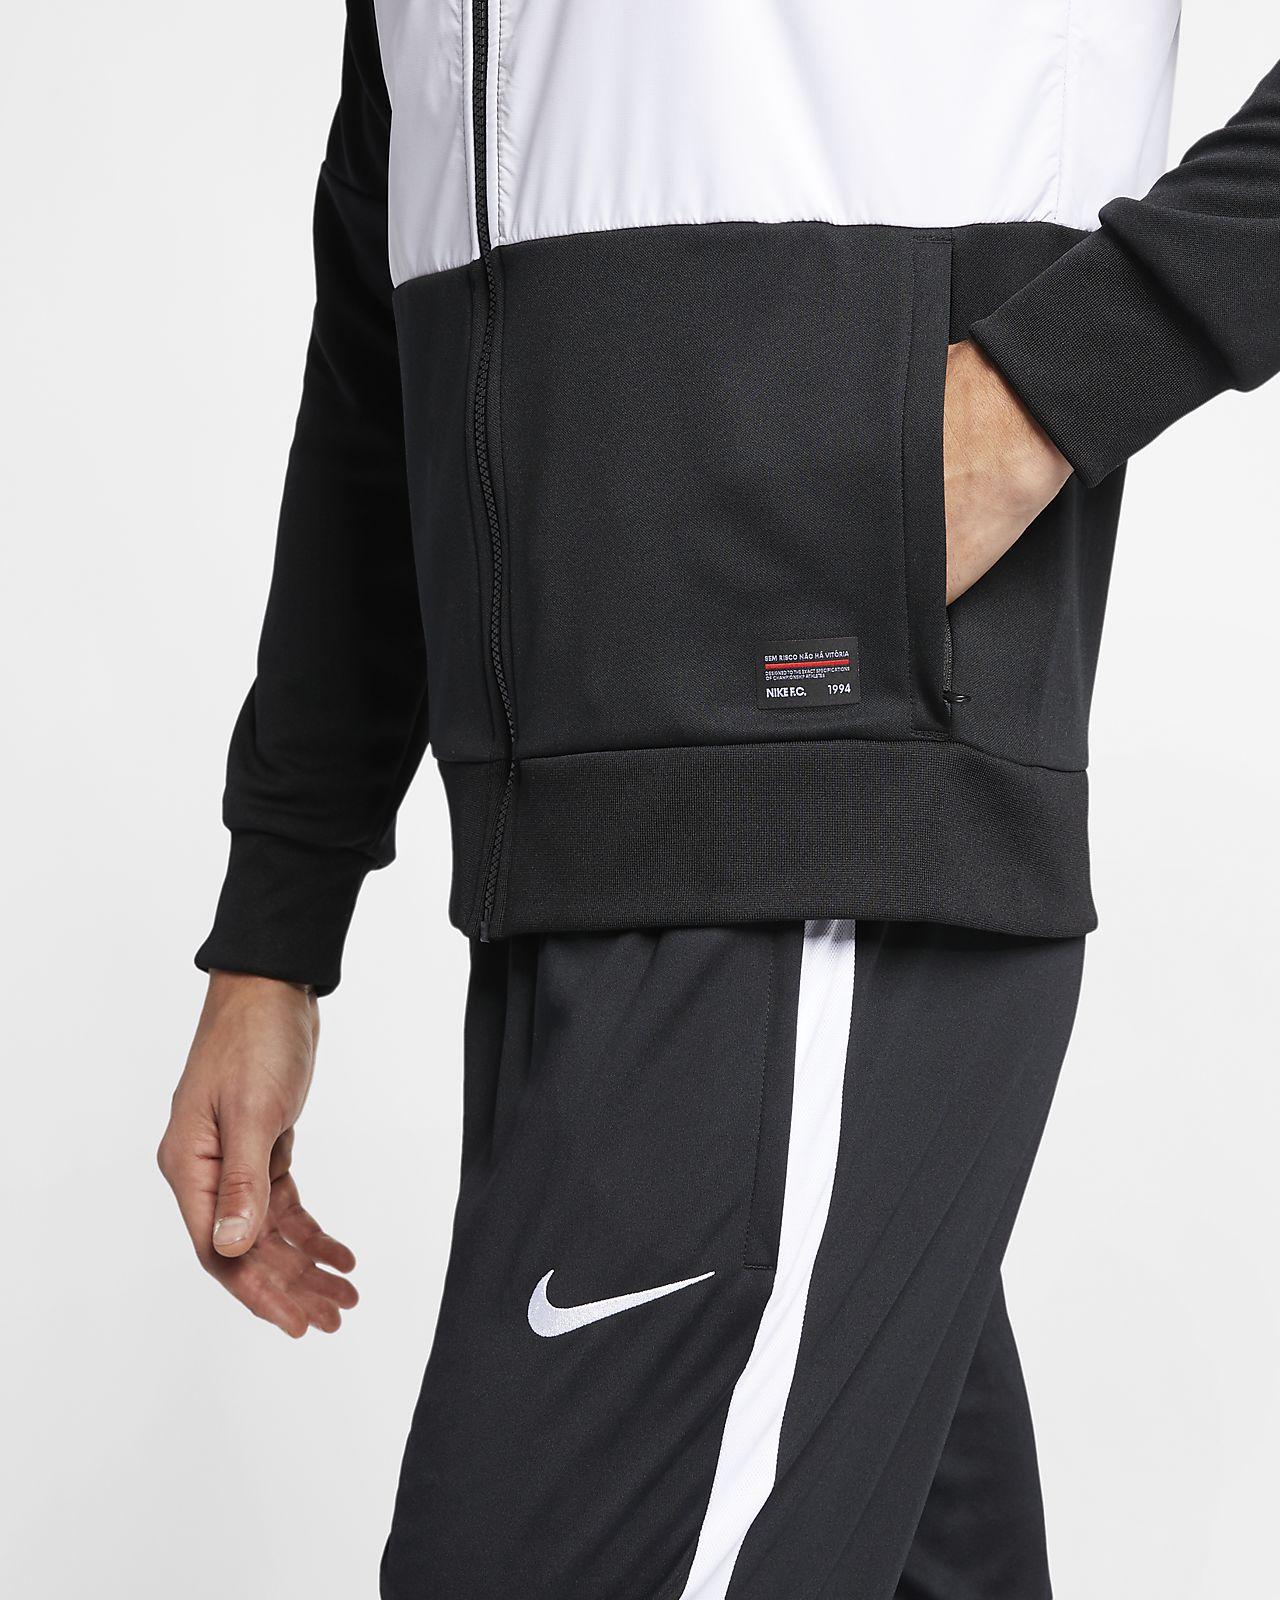 ccb7f9db5 Nike F.C. Men's Soccer Track Jacket. Nike.com